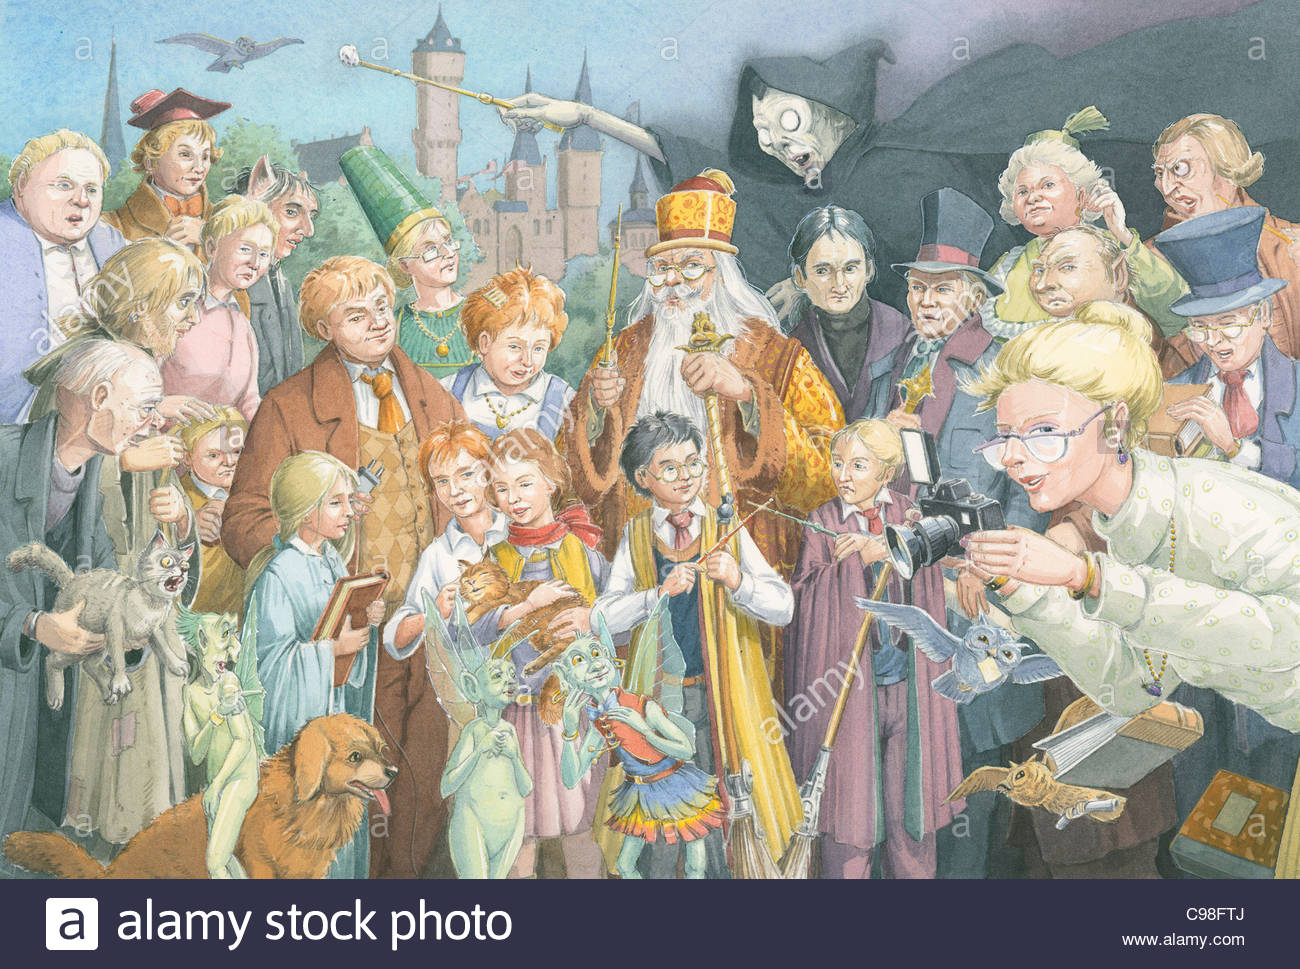 Harry Potter - Stock Image